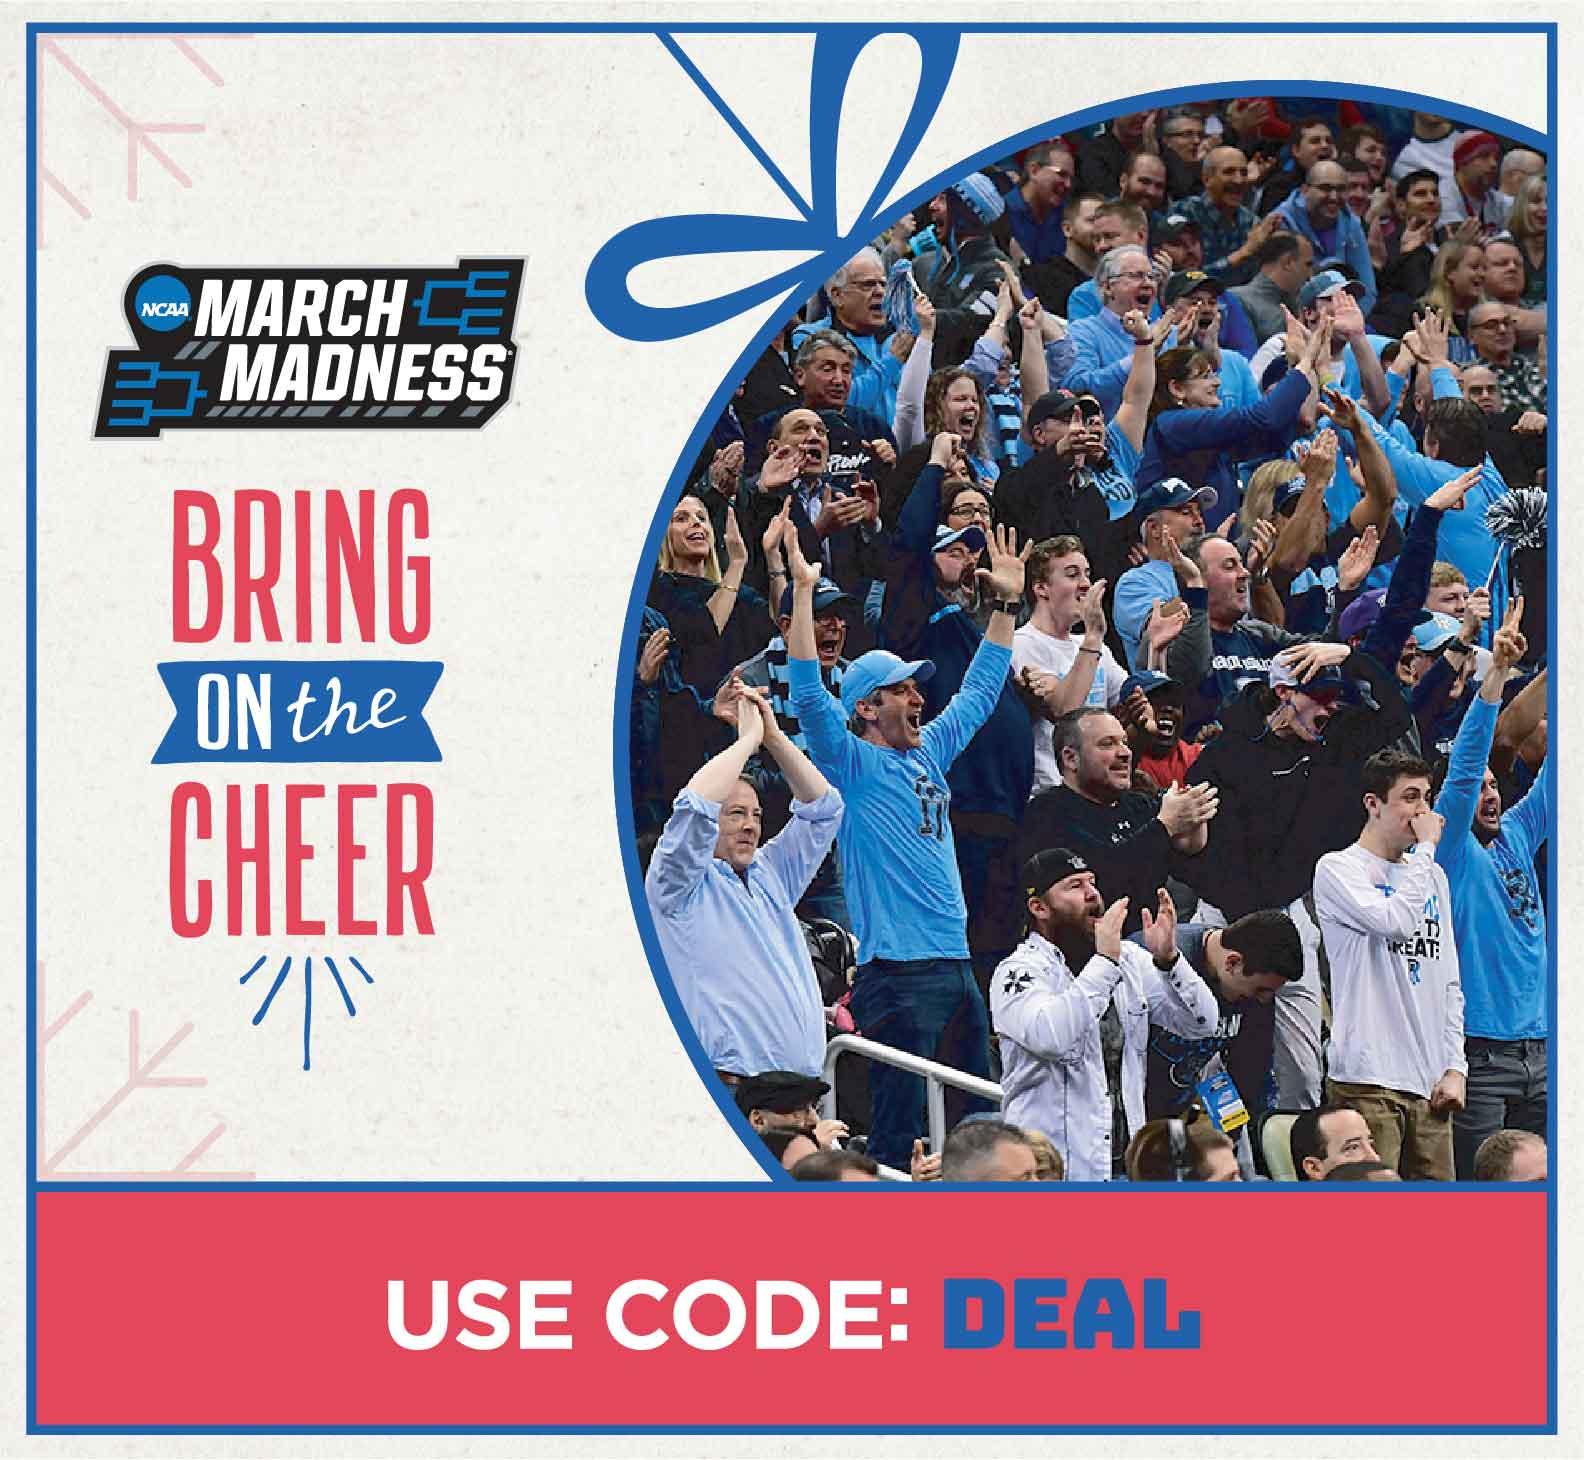 18-01708 - 2019 Columbia Prelim LOC Holideals Marketing Kit, Promo Code_380x350 web banner.jpg